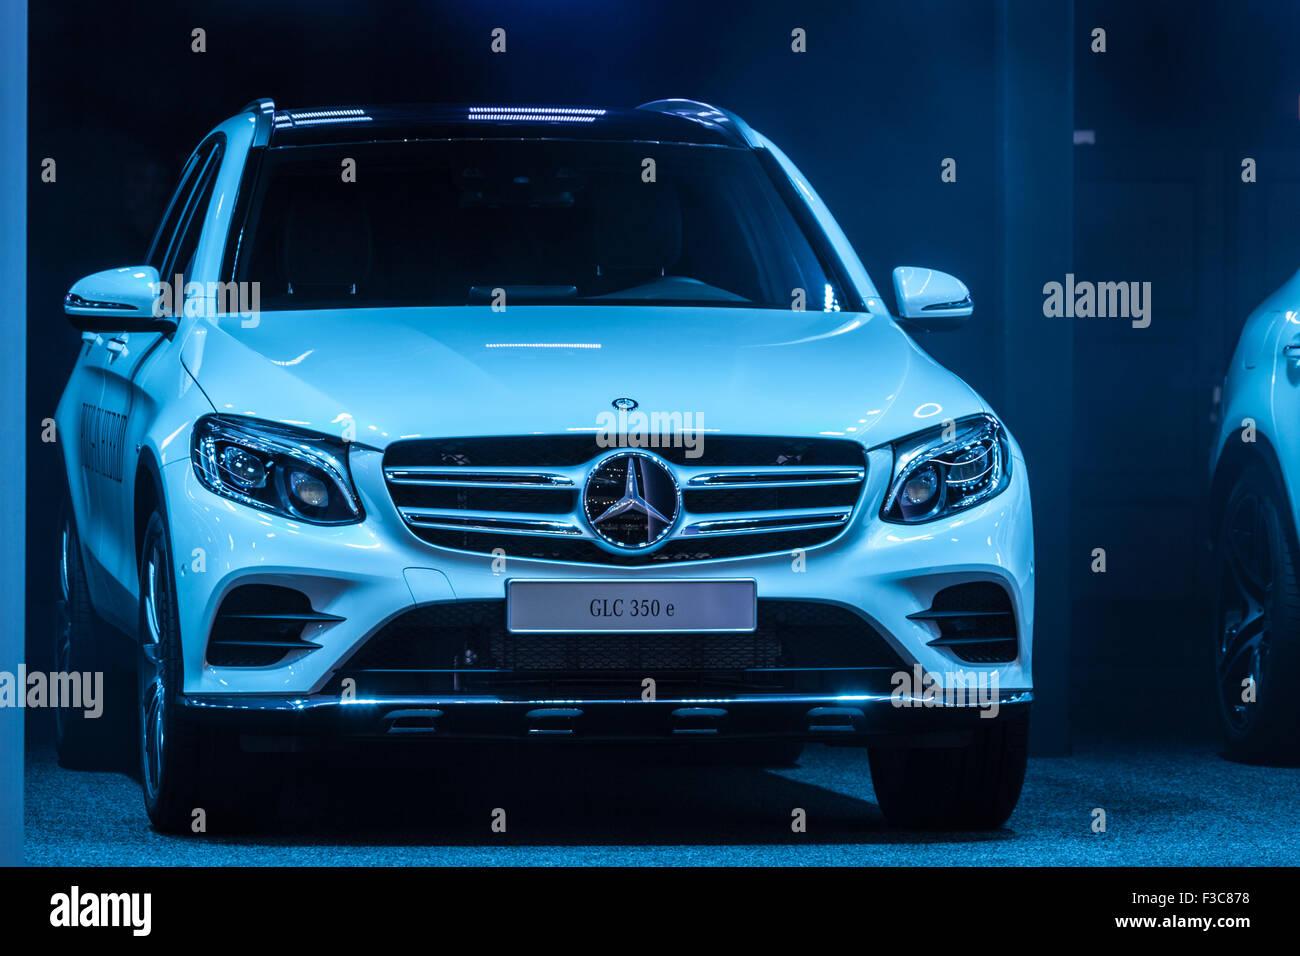 Mercedes Benz GLC 350 e at the IAA International Motor Show 2015 - Stock Image